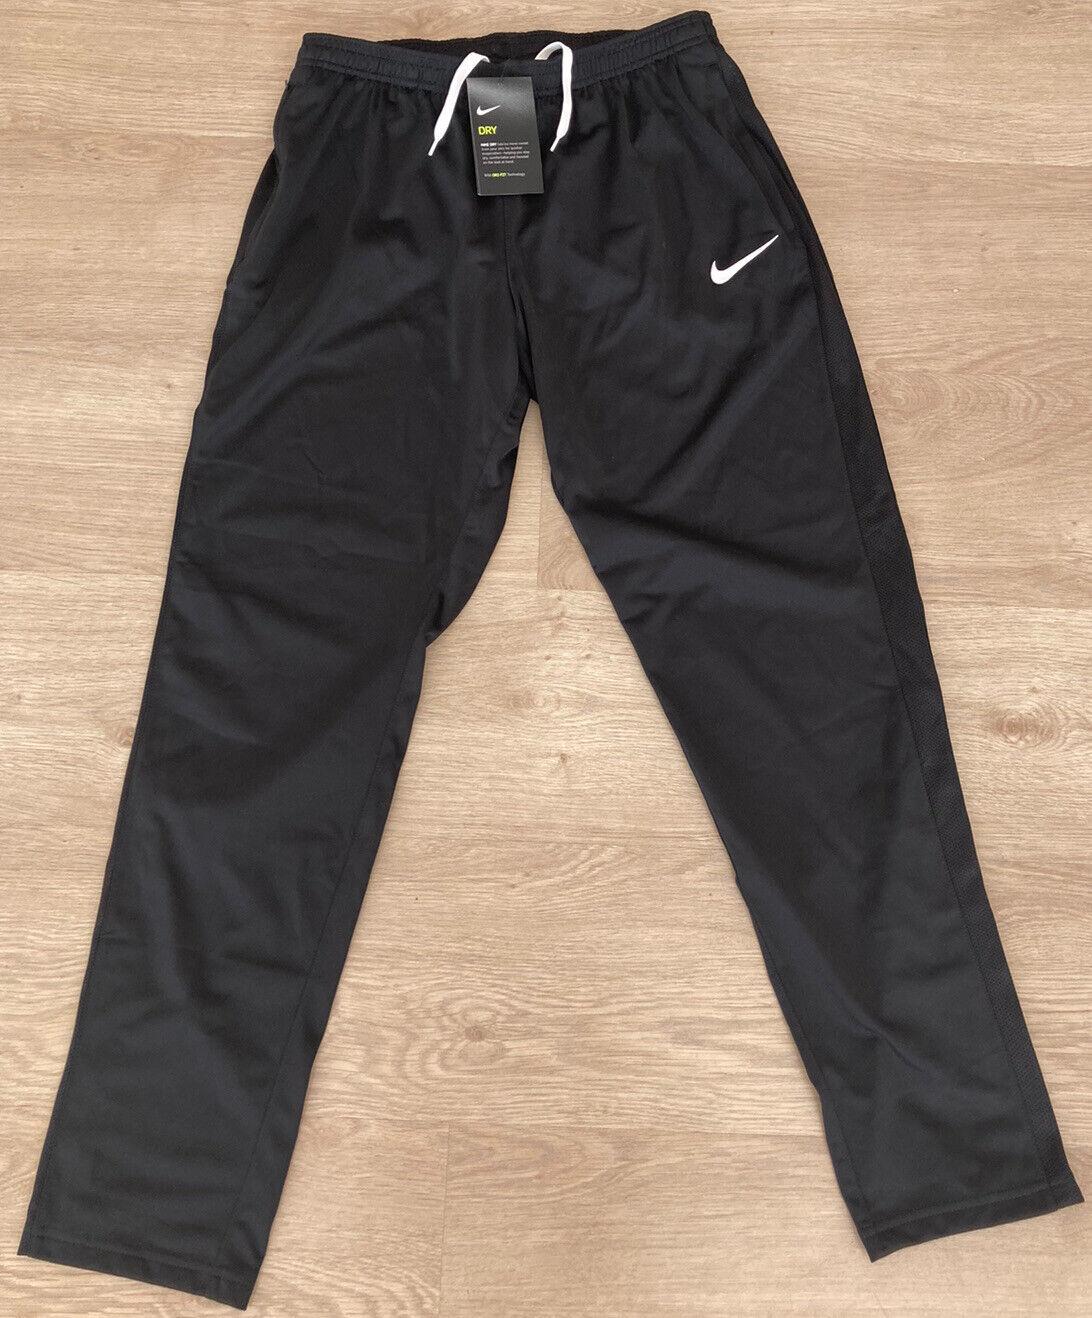 Ladies Nike Dri-Fit Tracksuit Bottoms Pants. Size M. Logo. Zip Pockets. BNWT